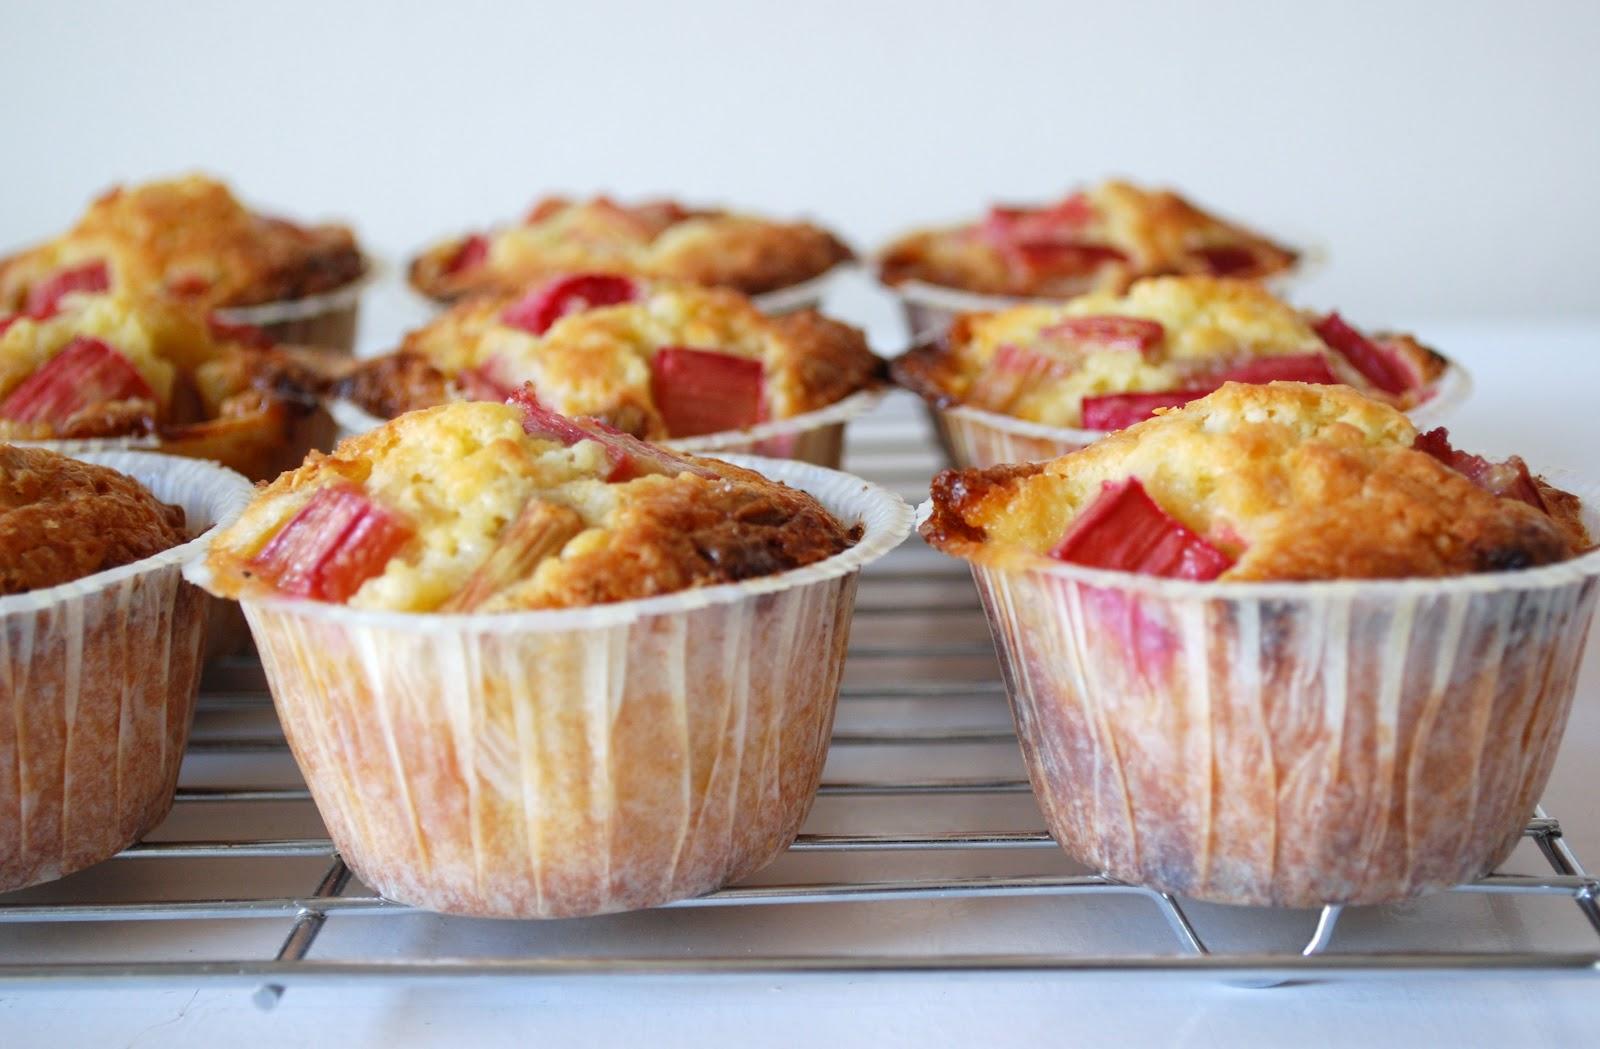 Erleperle Rabarber Muffins